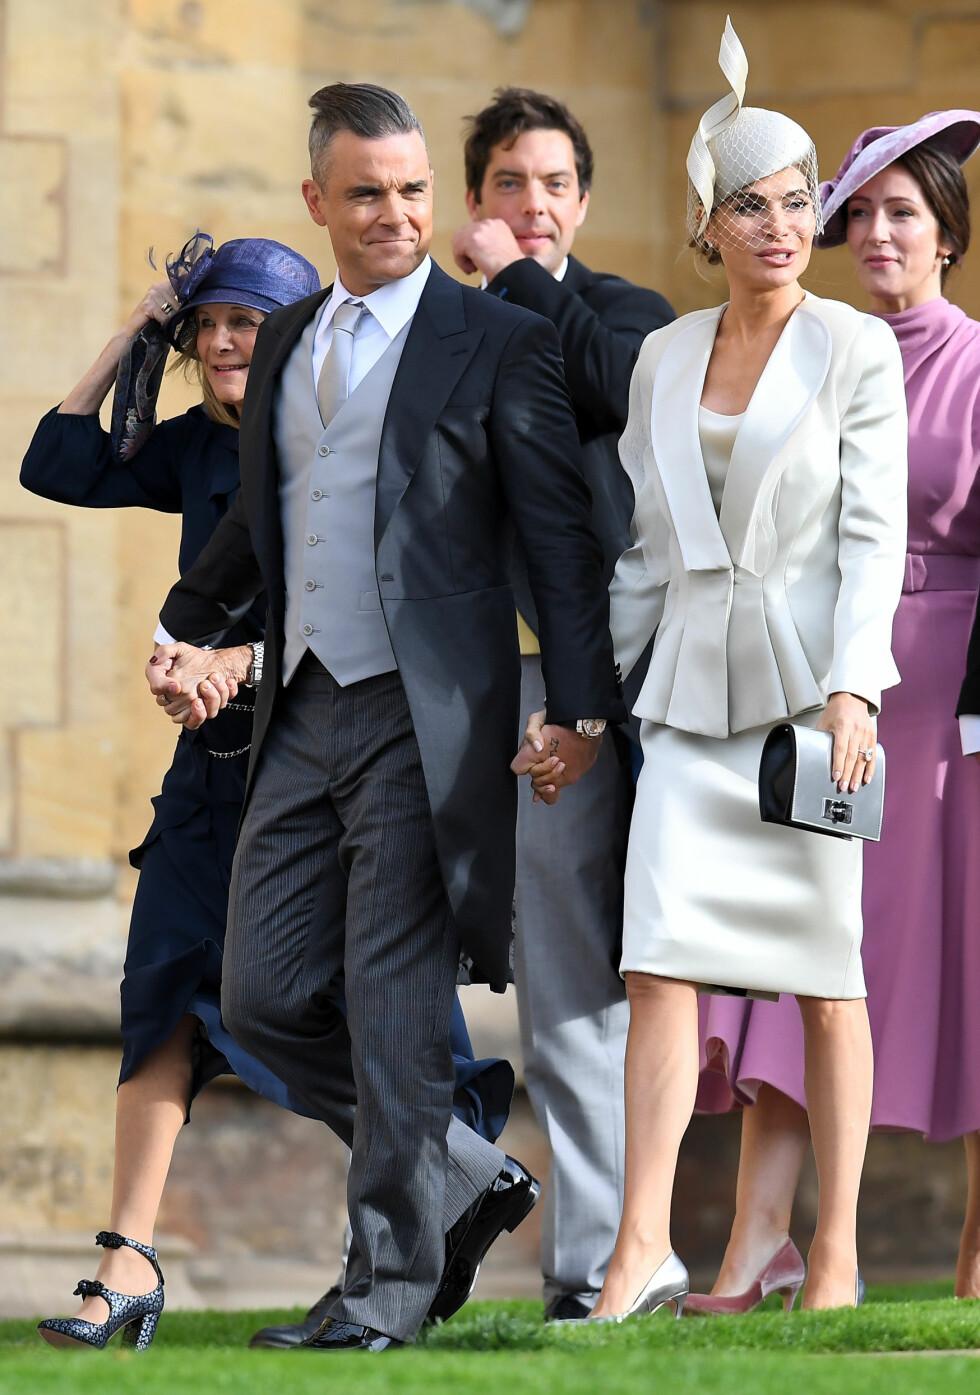 KONGELIG BRYLLUP: Ekteparet Robbie og Ayda Williams på vei inn til bryllupsseremonien. FOTO: NTB Scanpix